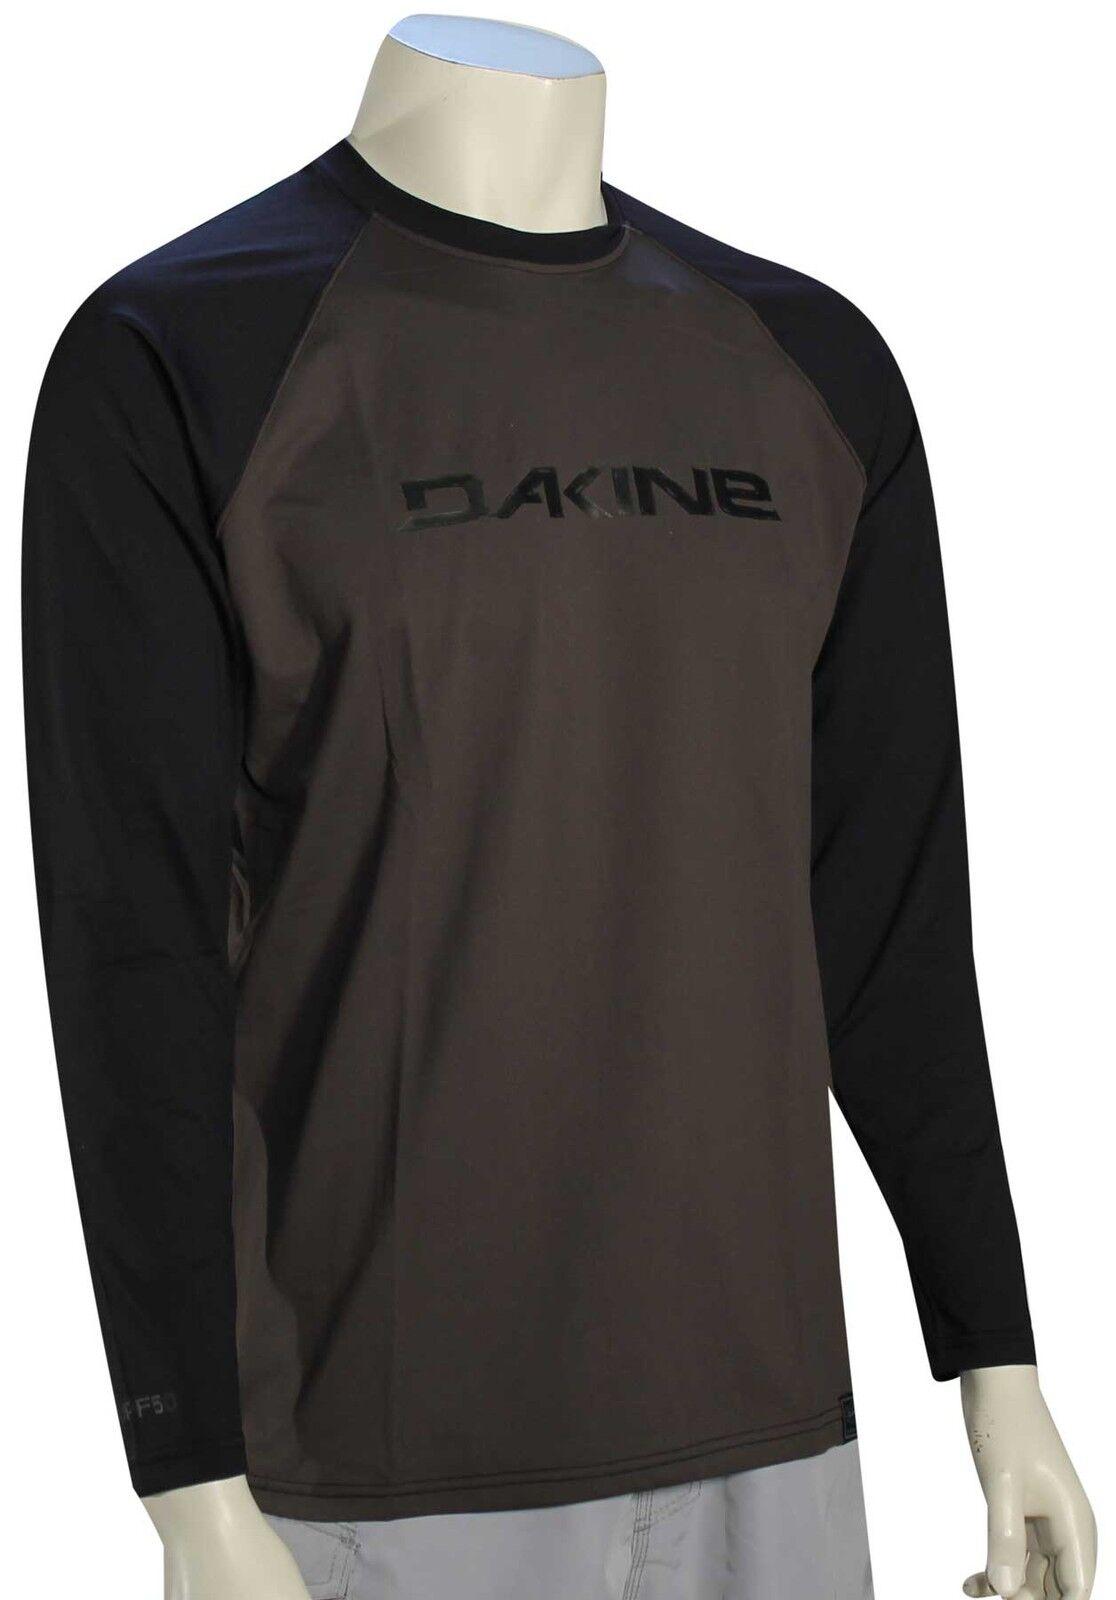 DaKine Watermans LS Surf Shirt - Titanium - New